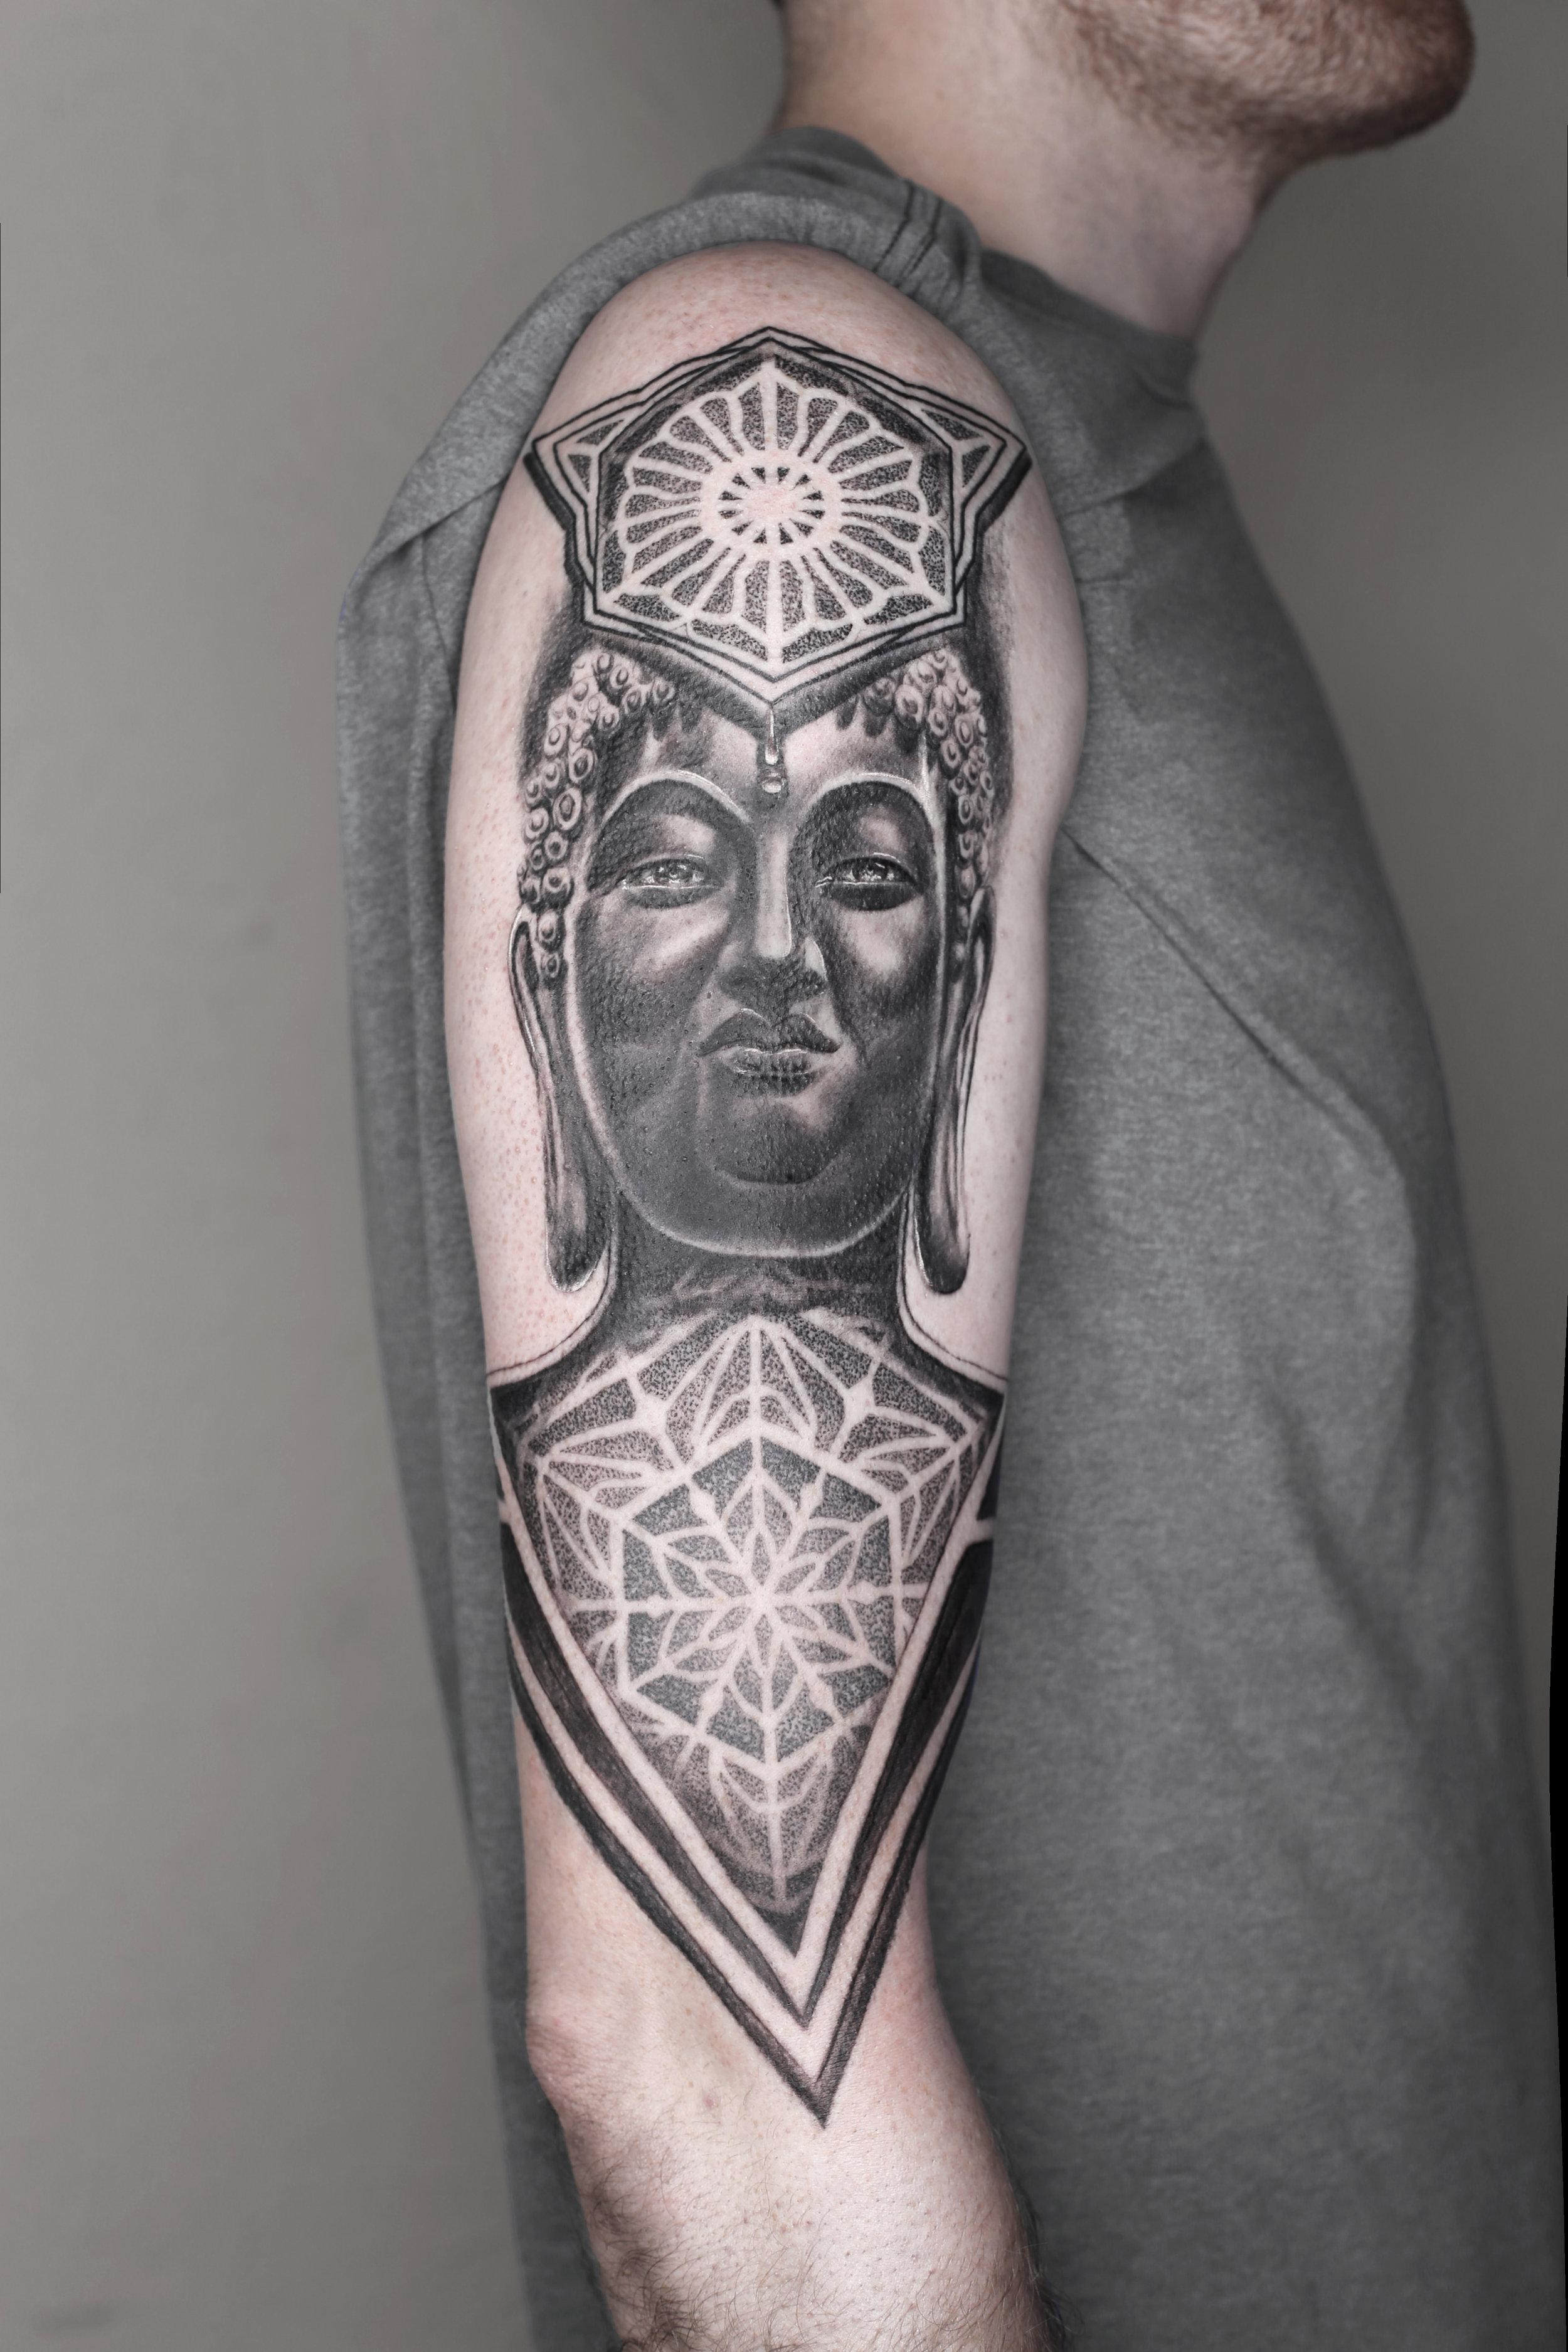 76ce57920ce02 buddah ejay tattoo dalls texas singleton tattoo ink master ink angel thomas  hooper trinity groves .